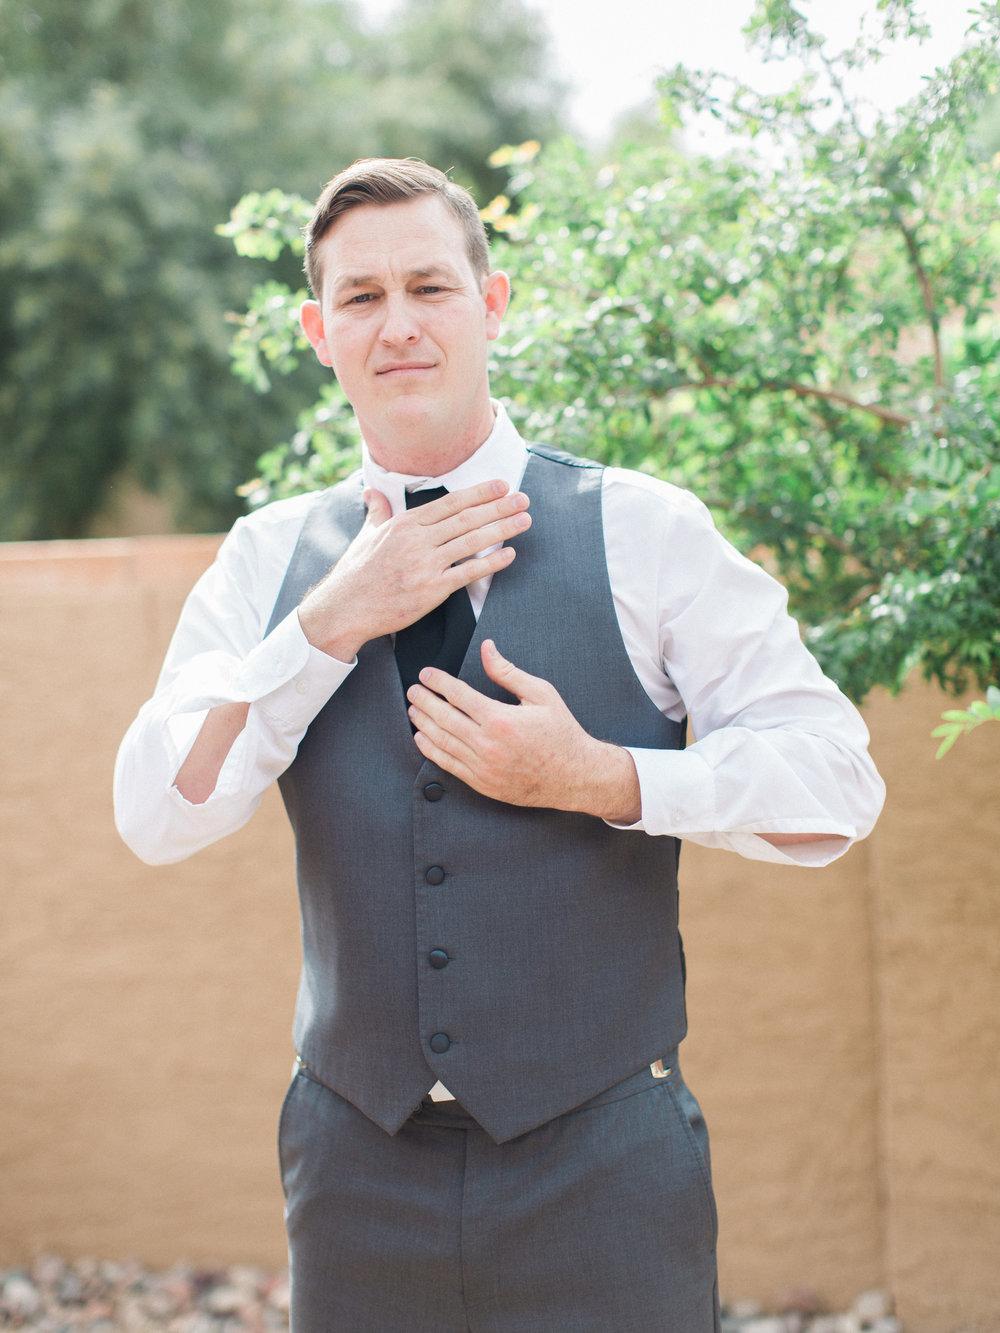 scottsdale, AZ groomsman attire